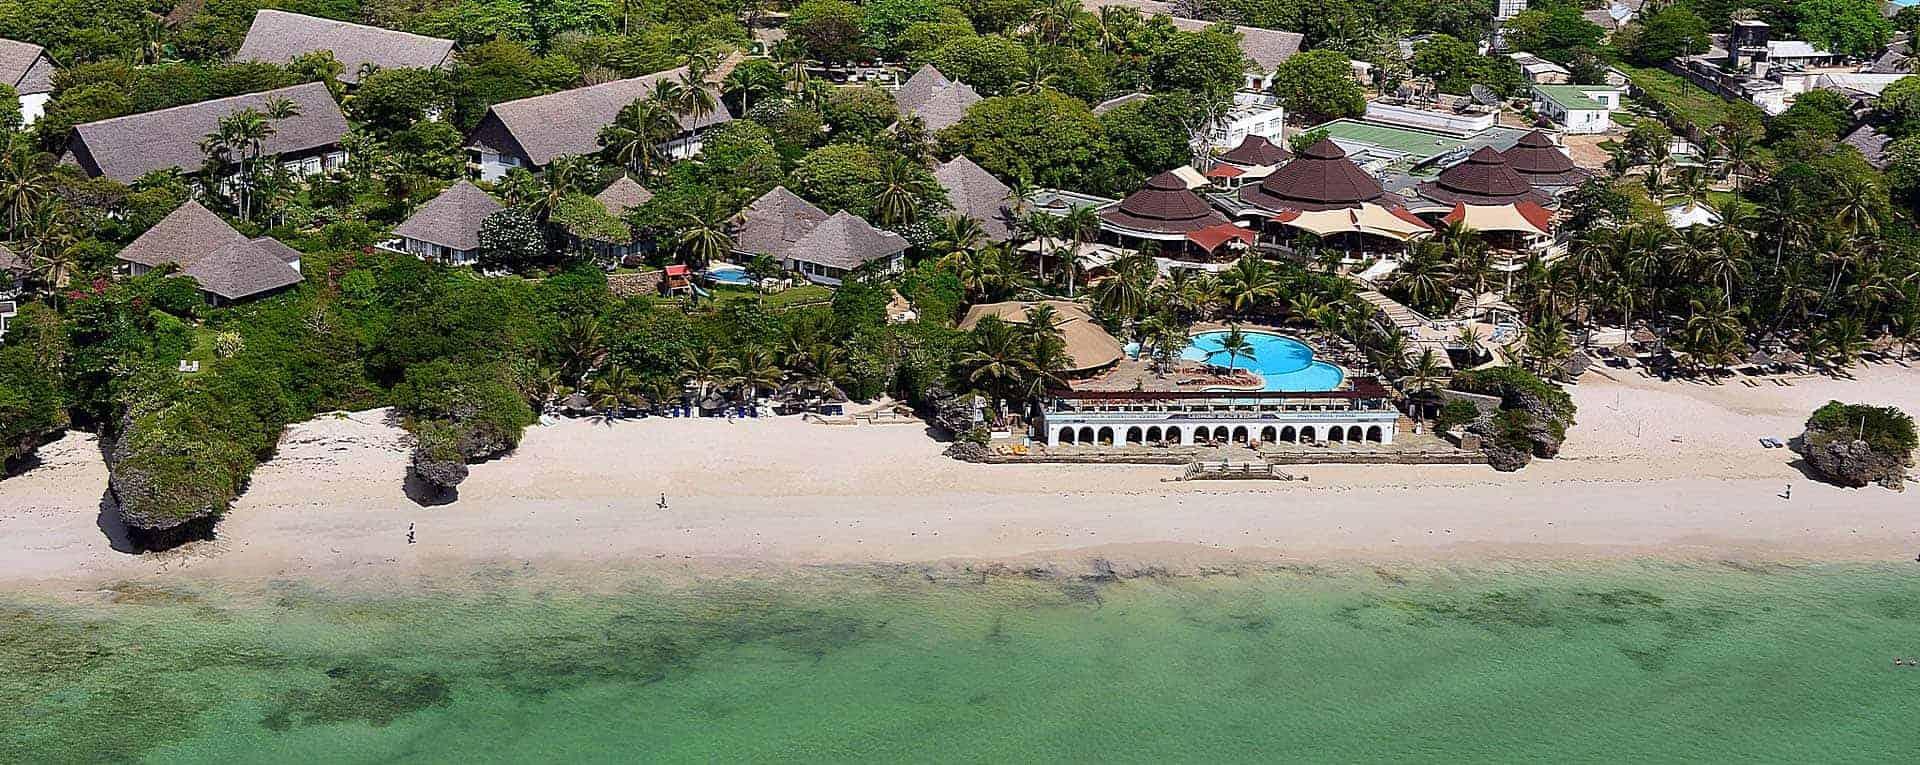 Diani, Kenya | Facts & Information about Diani beach